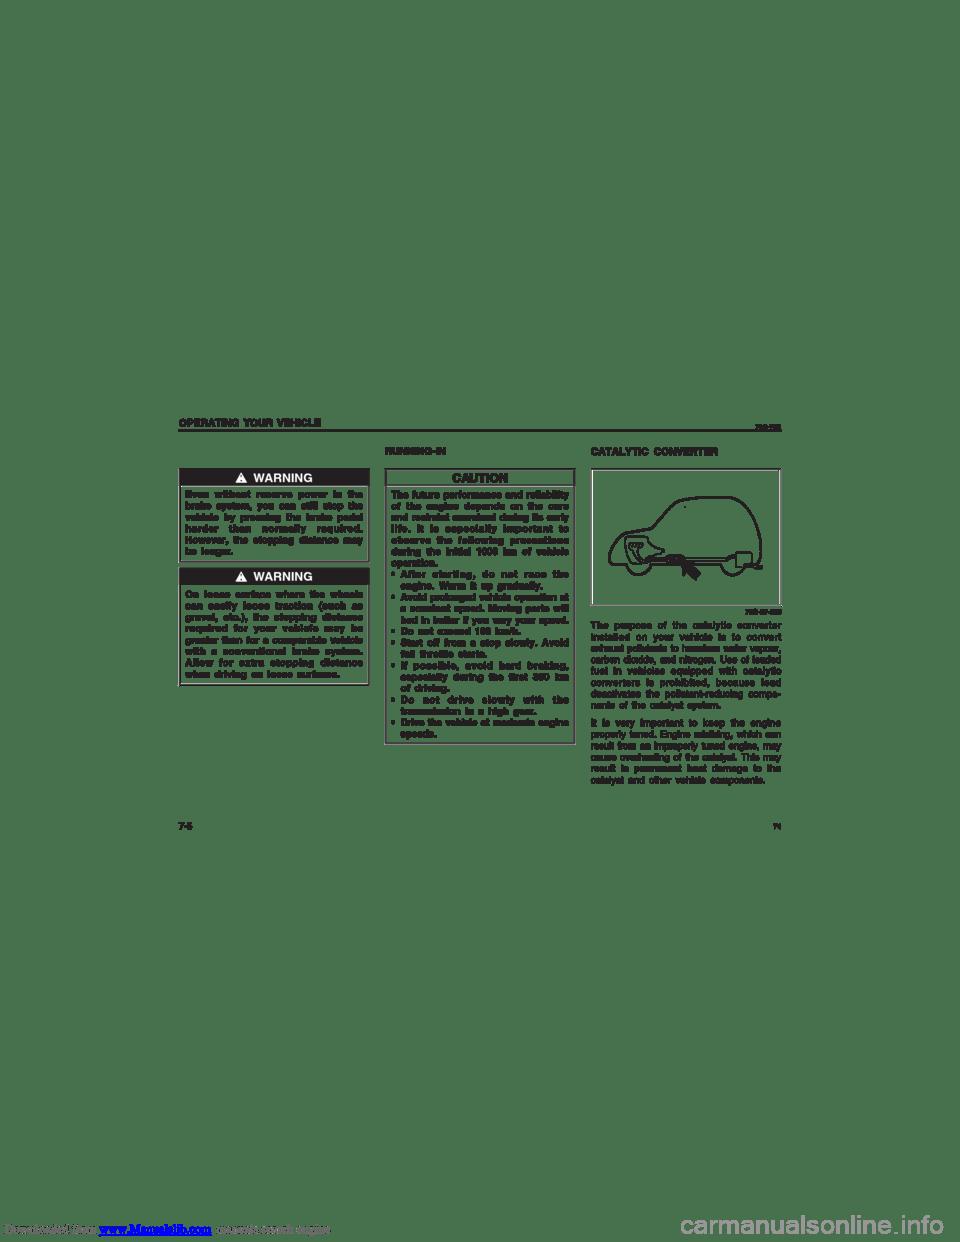 SUZUKI ALTO 2007 6.G Manual PDF (139 Pages)